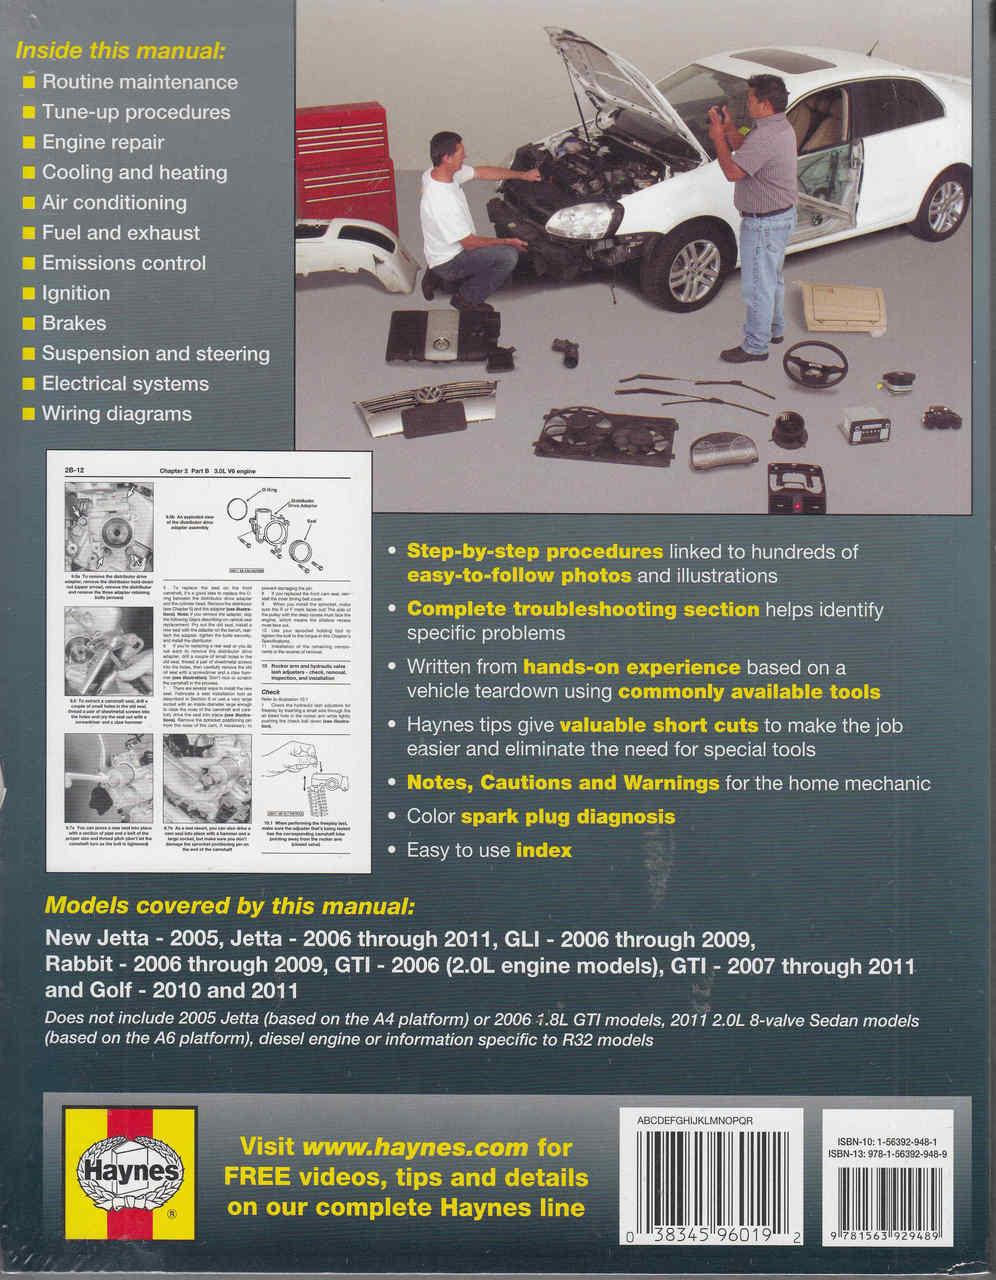 VW Jetta, Rabbit, GTi & Golf 2006 - 2011 Repair Manual